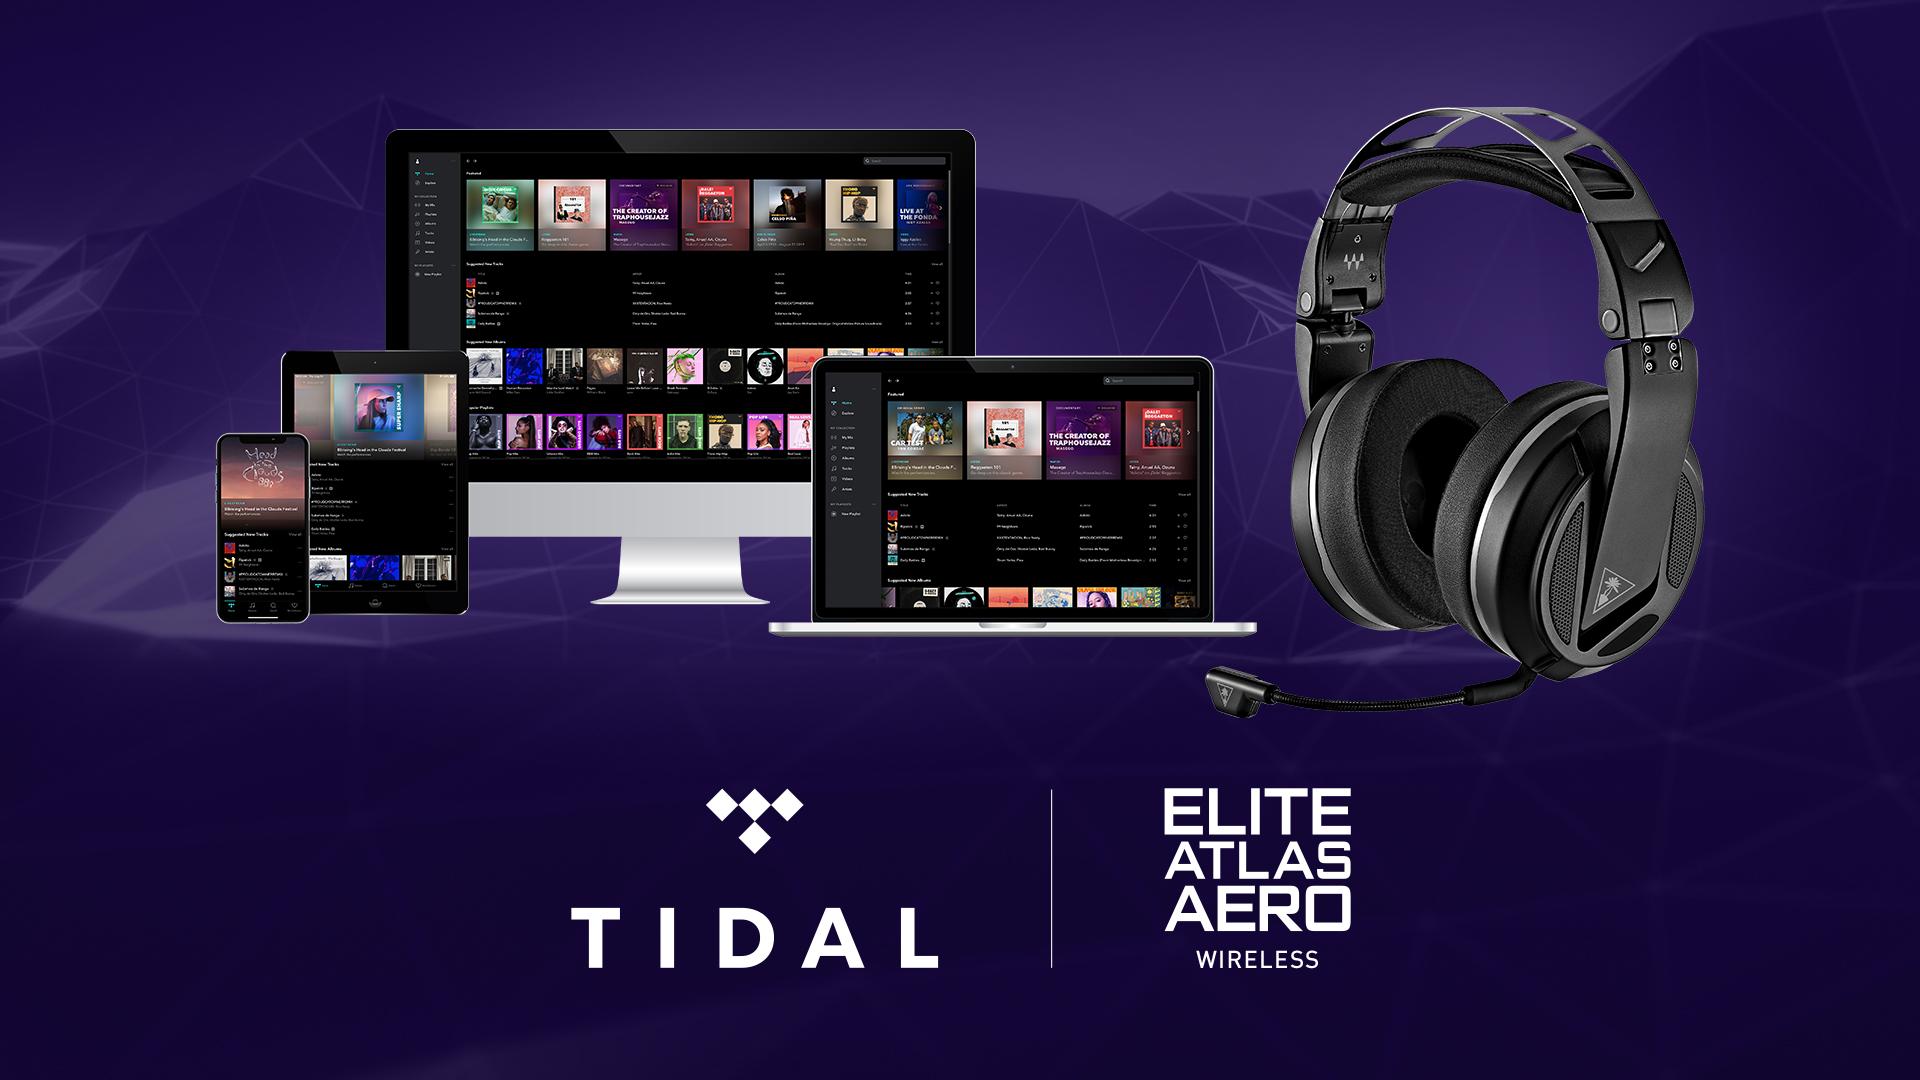 Elite Atlas Aero Wireless High-Performance PC Headset | TIDAL